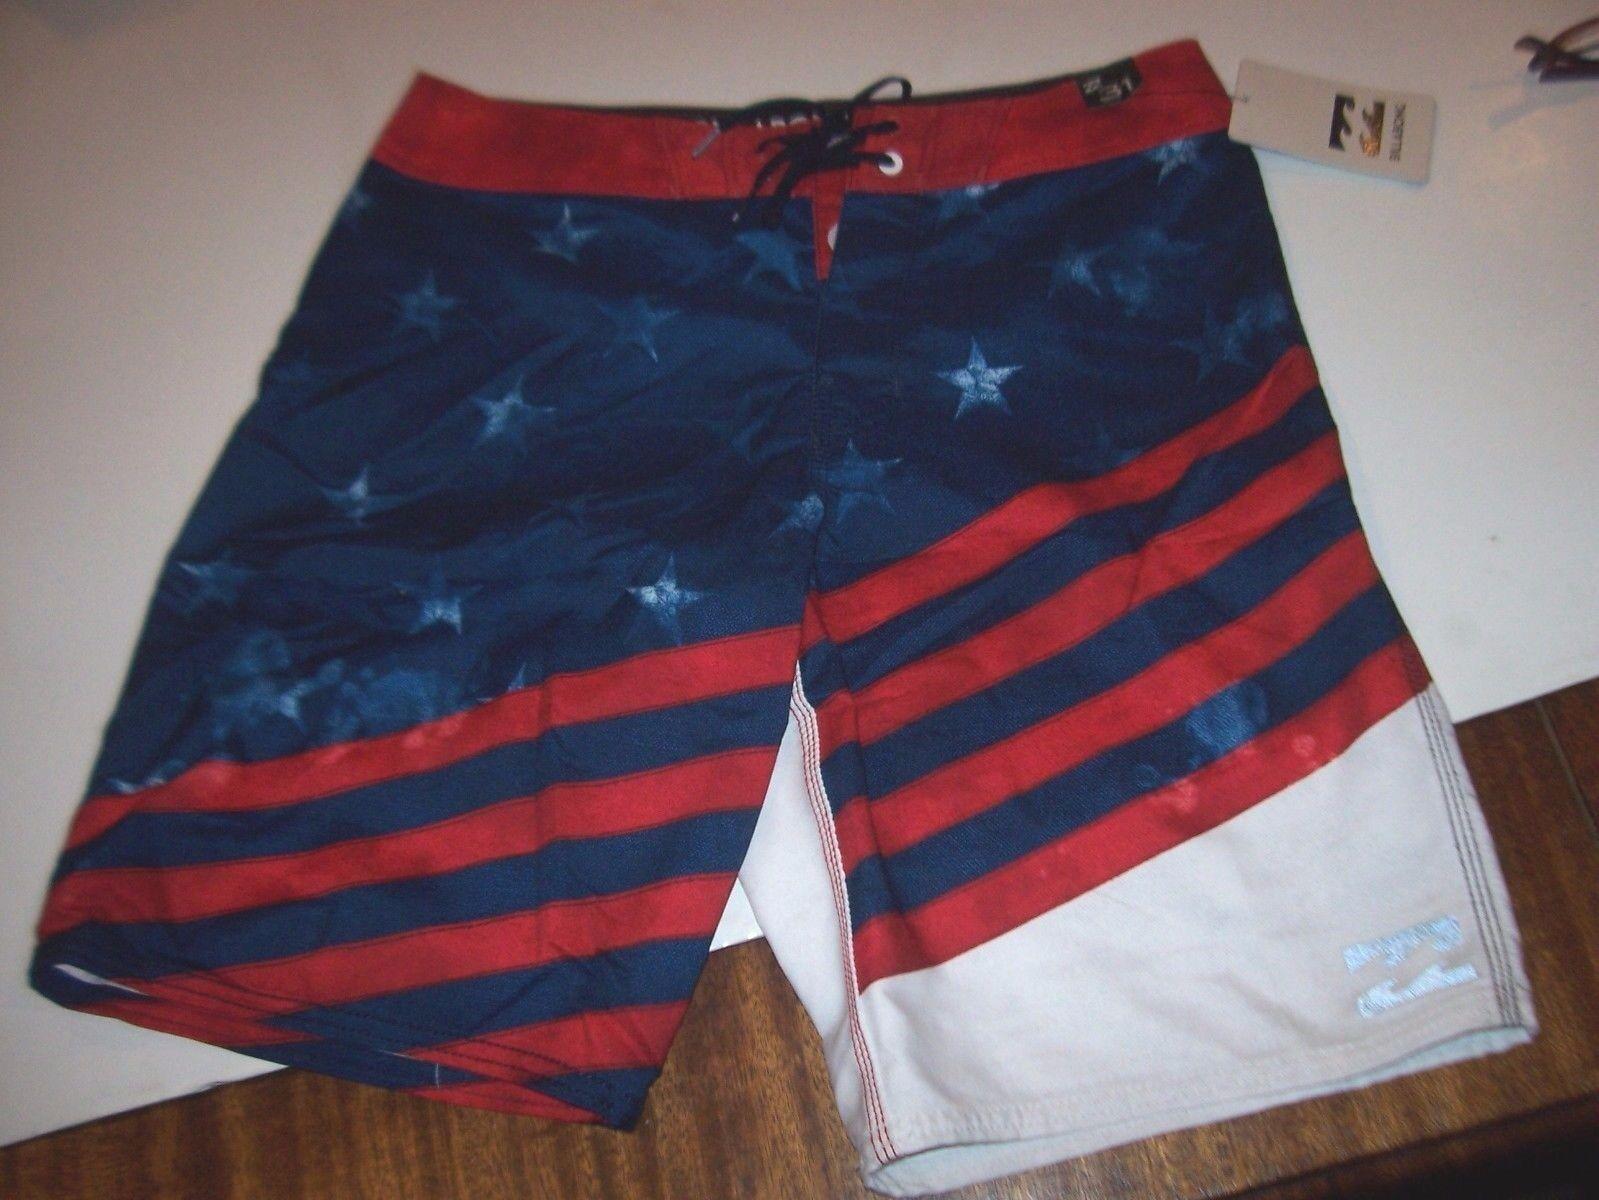 NEW BILLABONG swim board shorts trunks red white bluee American Flag sz 30 or 31